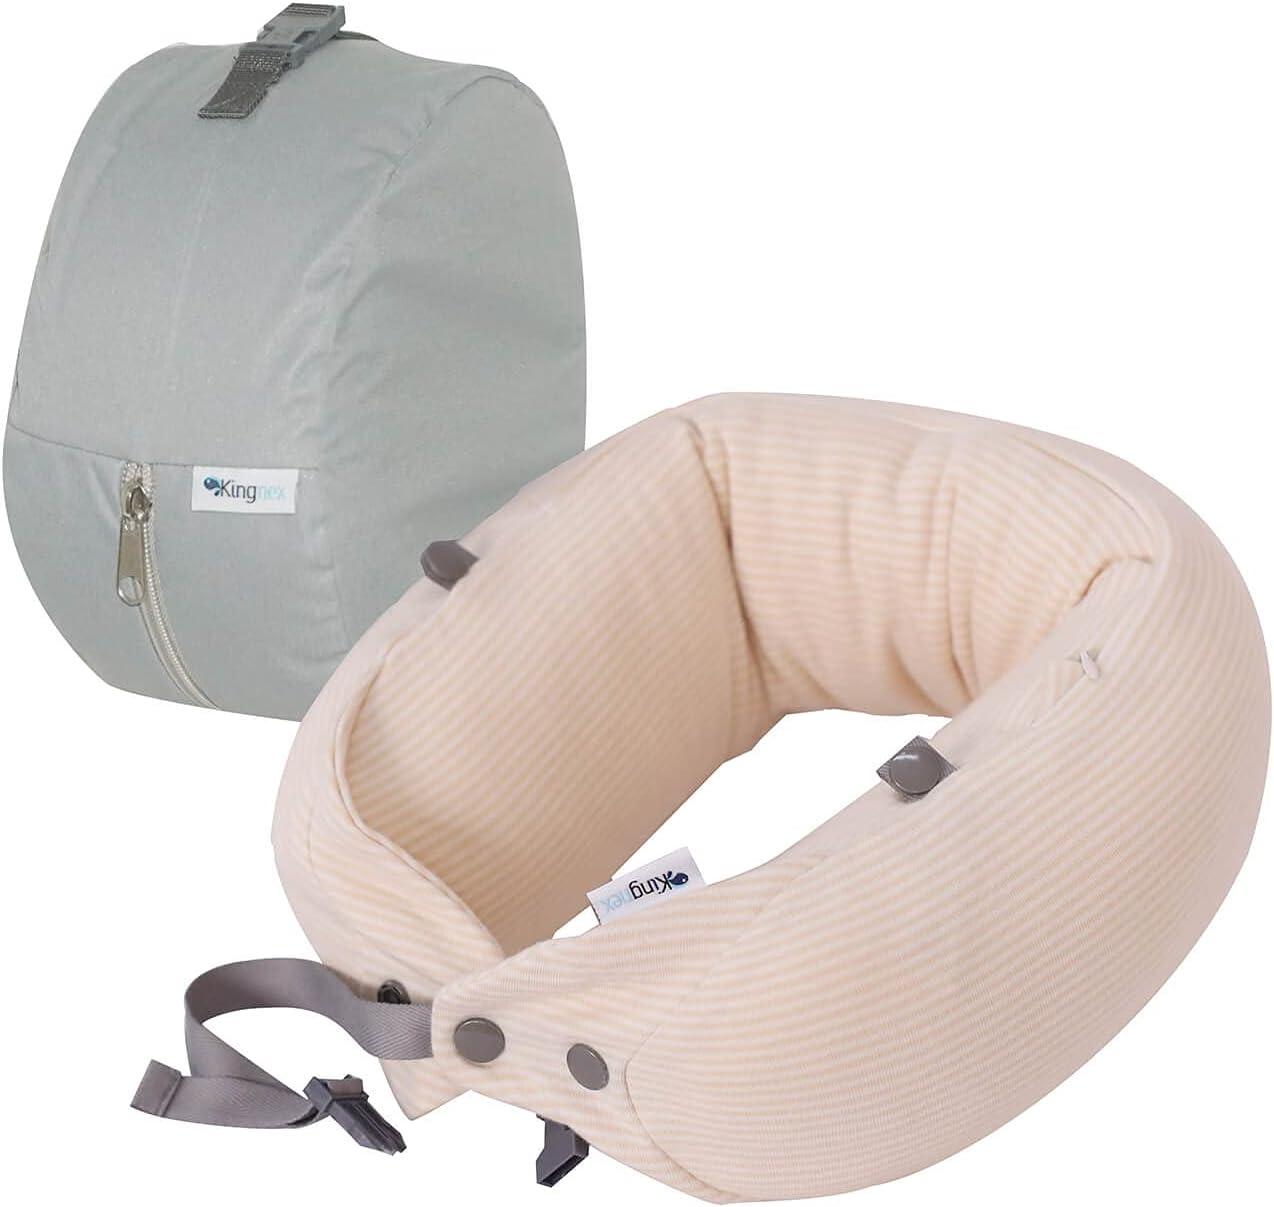 Kingnex Adjustable Travel Pillow for Cheap Support Jacksonville Mall Shredded Neck with